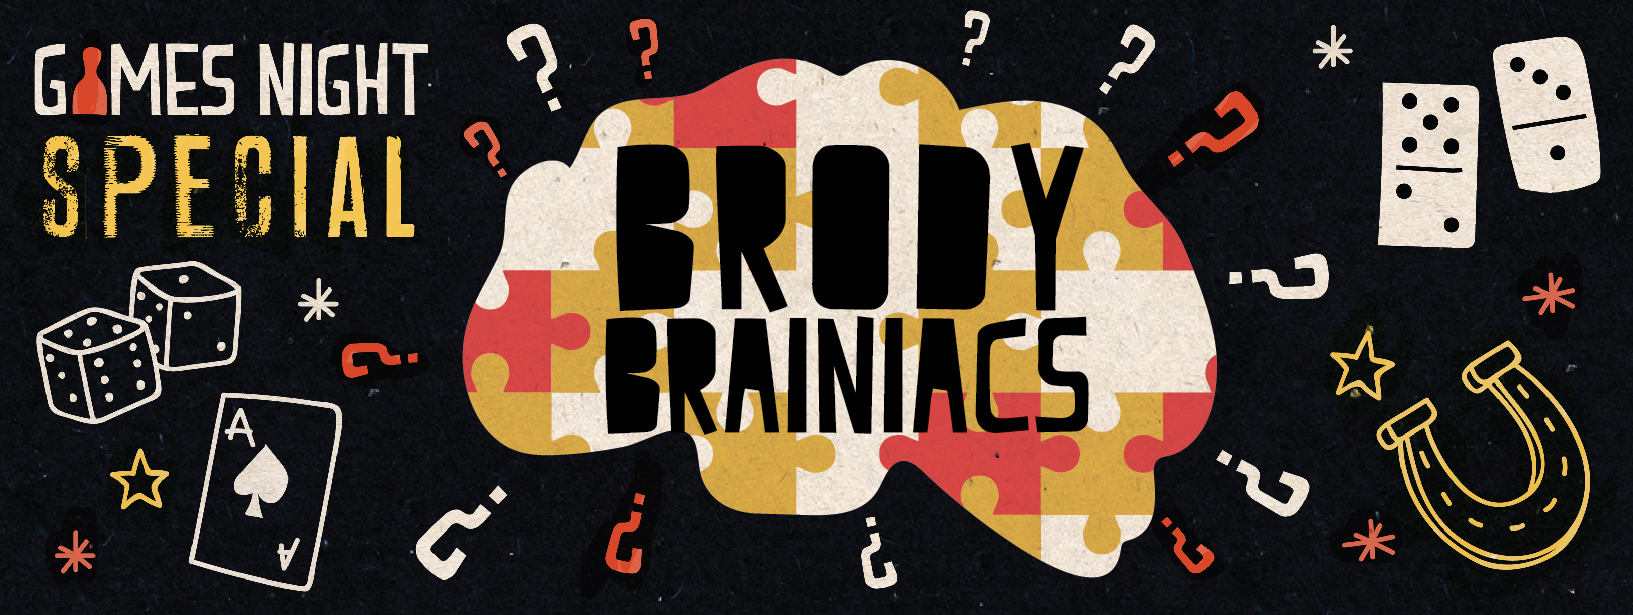 games-night-special-brainiacs-04.jpg